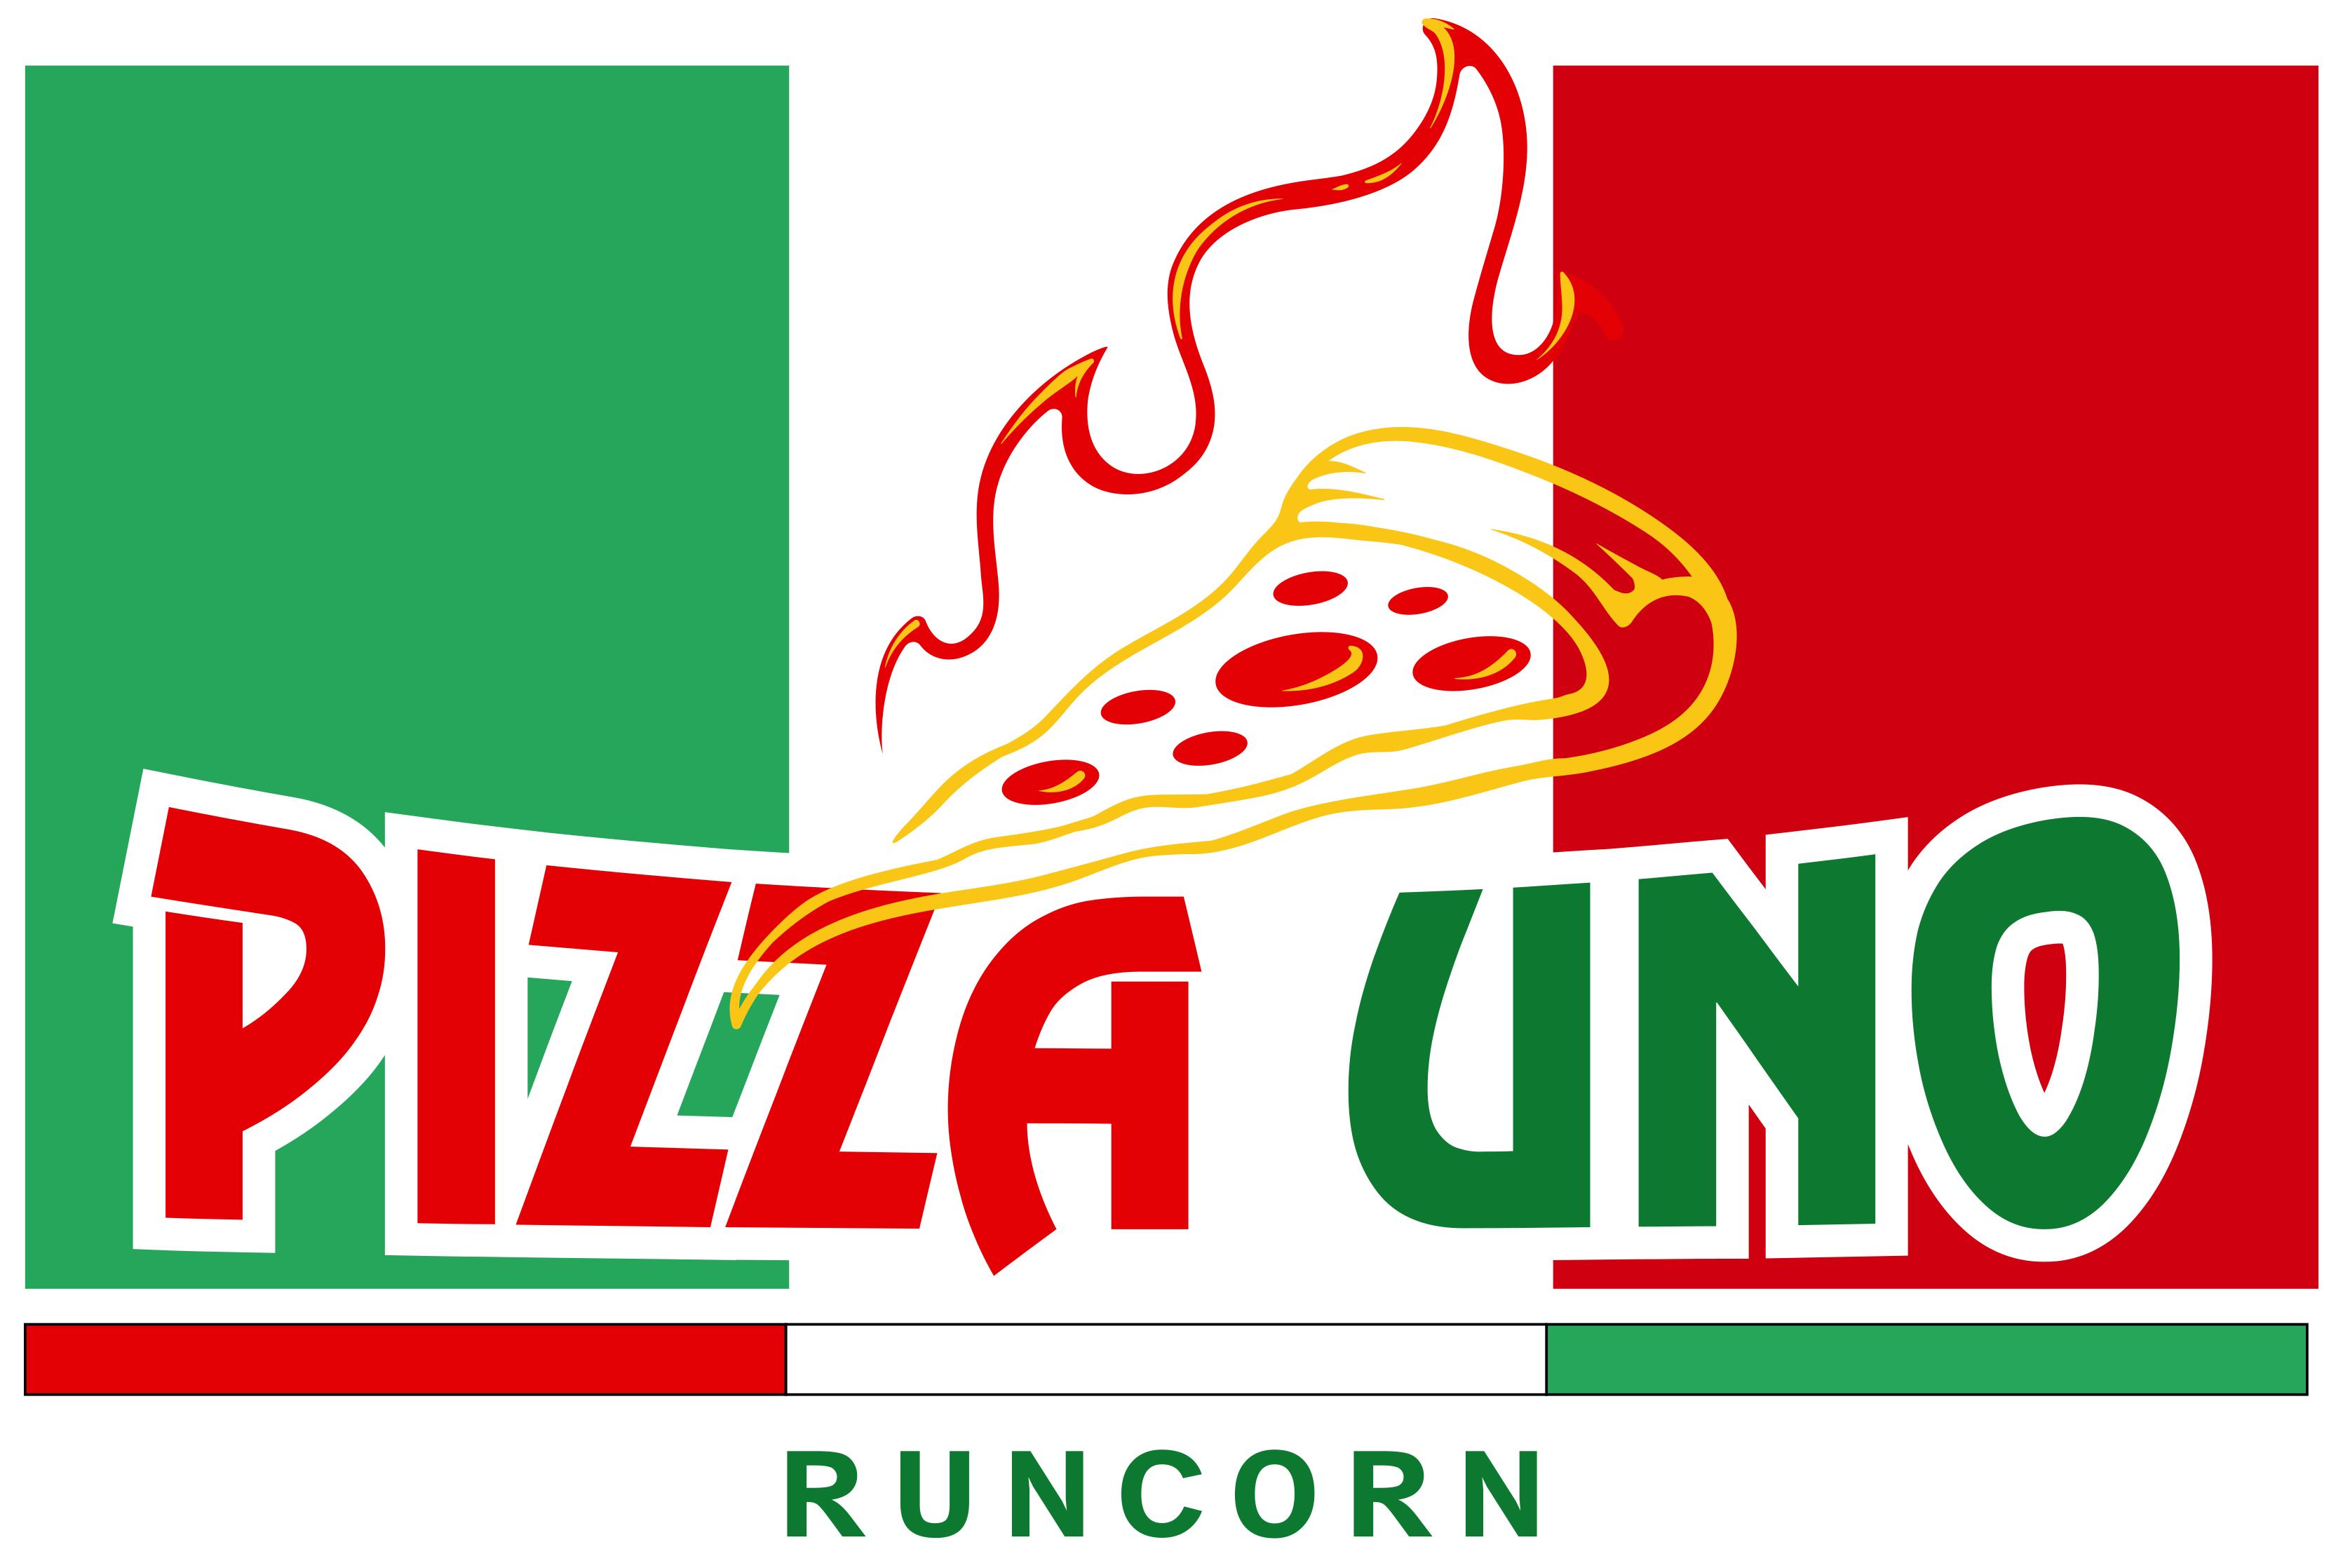 Pizza Uno Runcorn Pizza Uno Runcorn Runcorn Runcorn